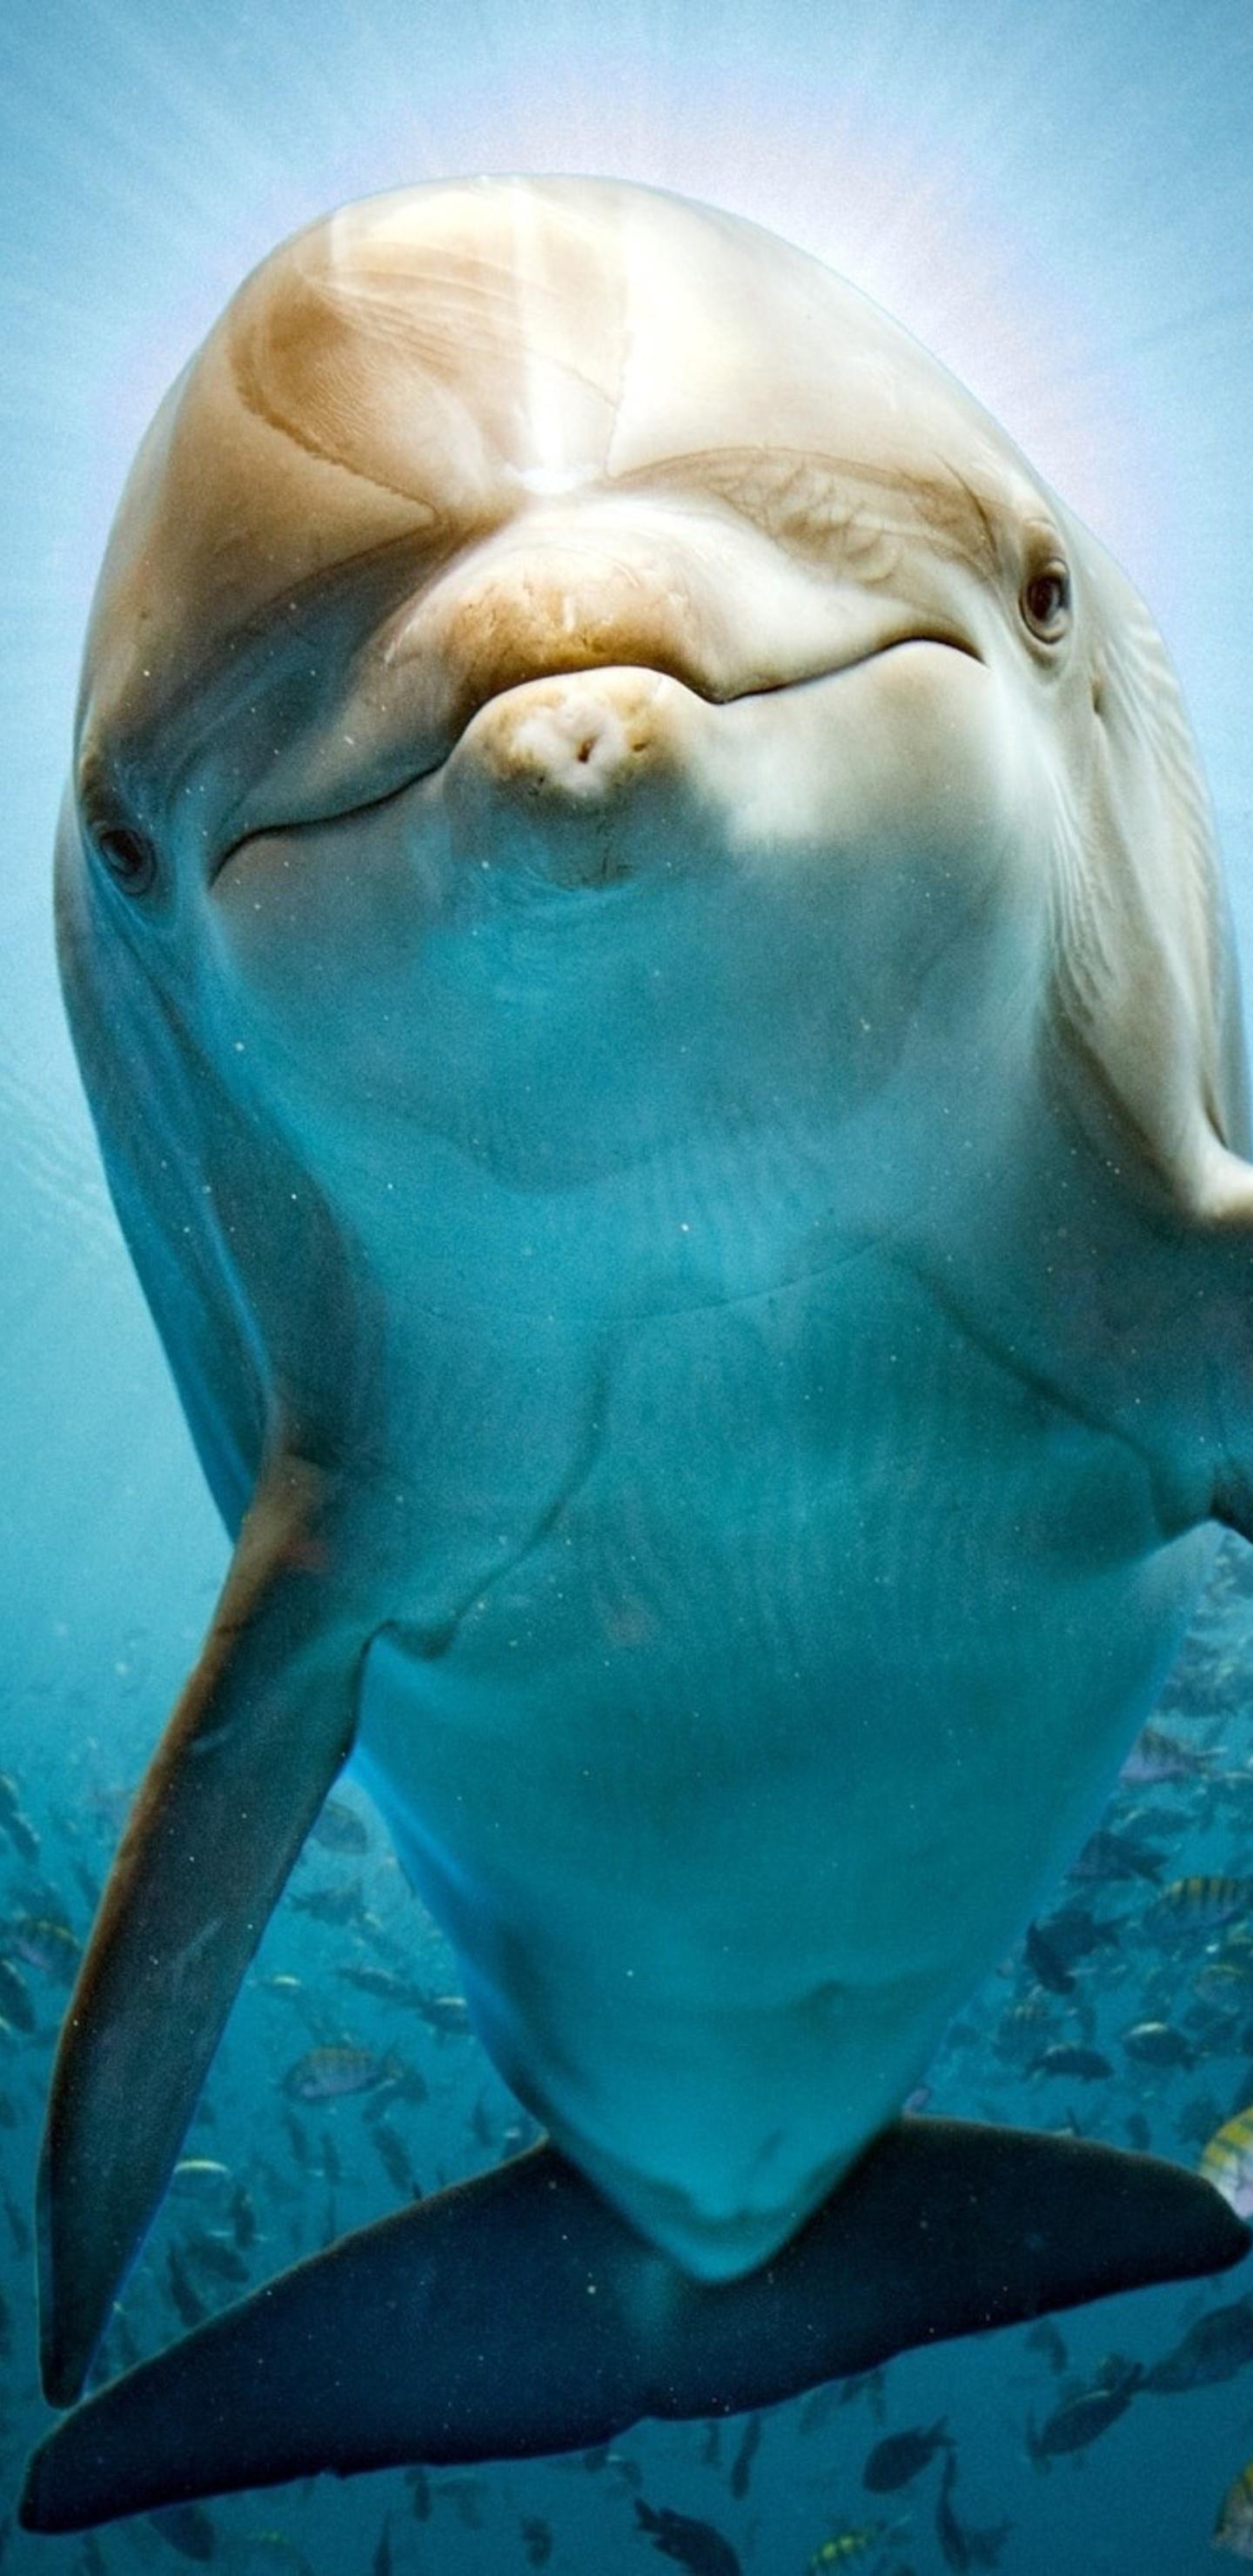 1440x2960 Dolphin Hd Samsung Galaxy Note 9 8 S9 S8 S8 Qhd Hd 4k